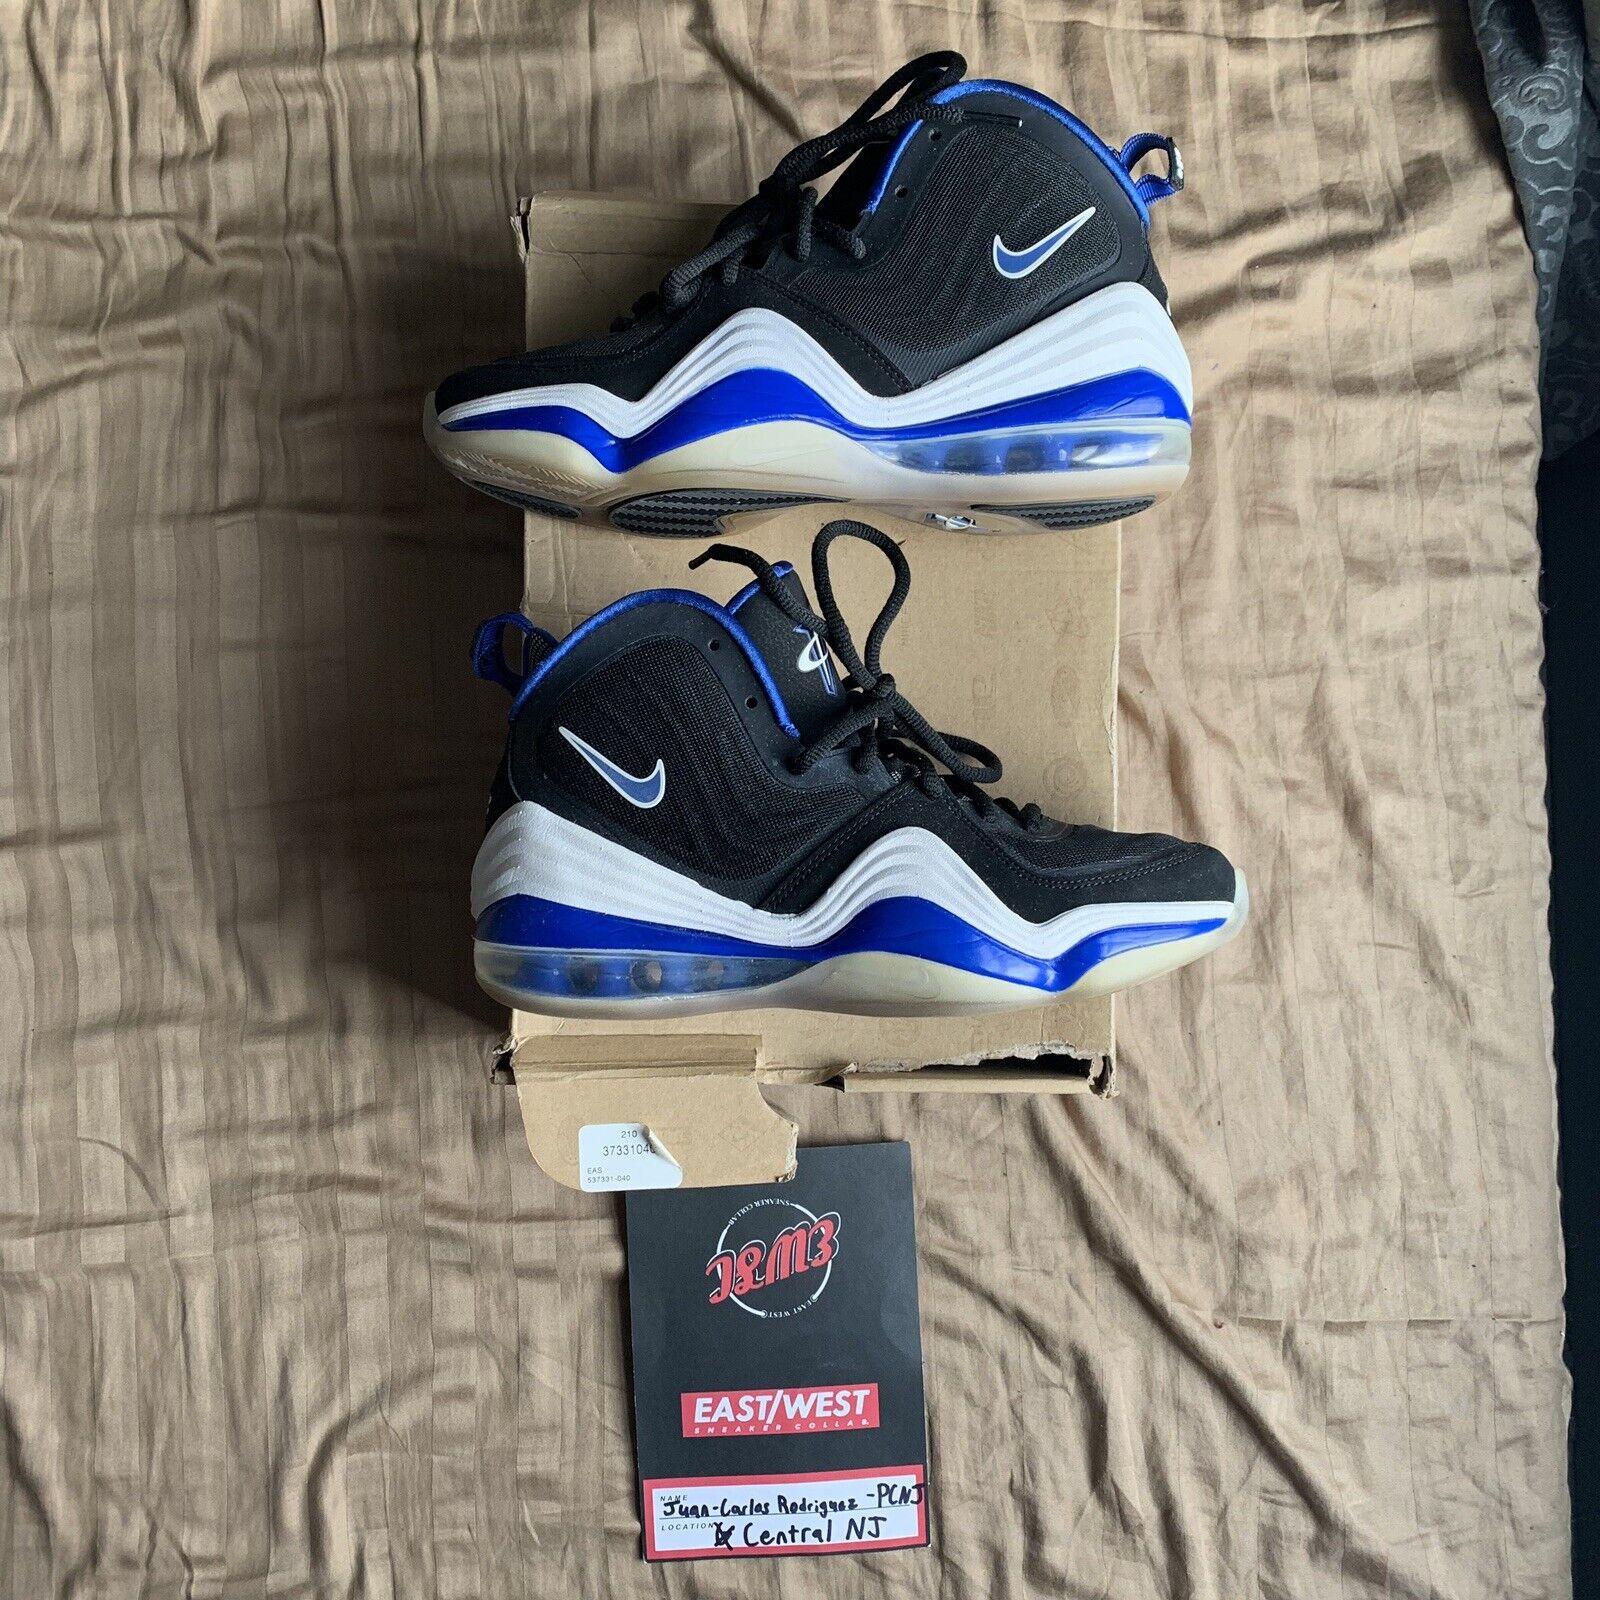 Nike Air Penny V 5 Game Royal White Orlando 537331-040 Sz 7 foamposite one